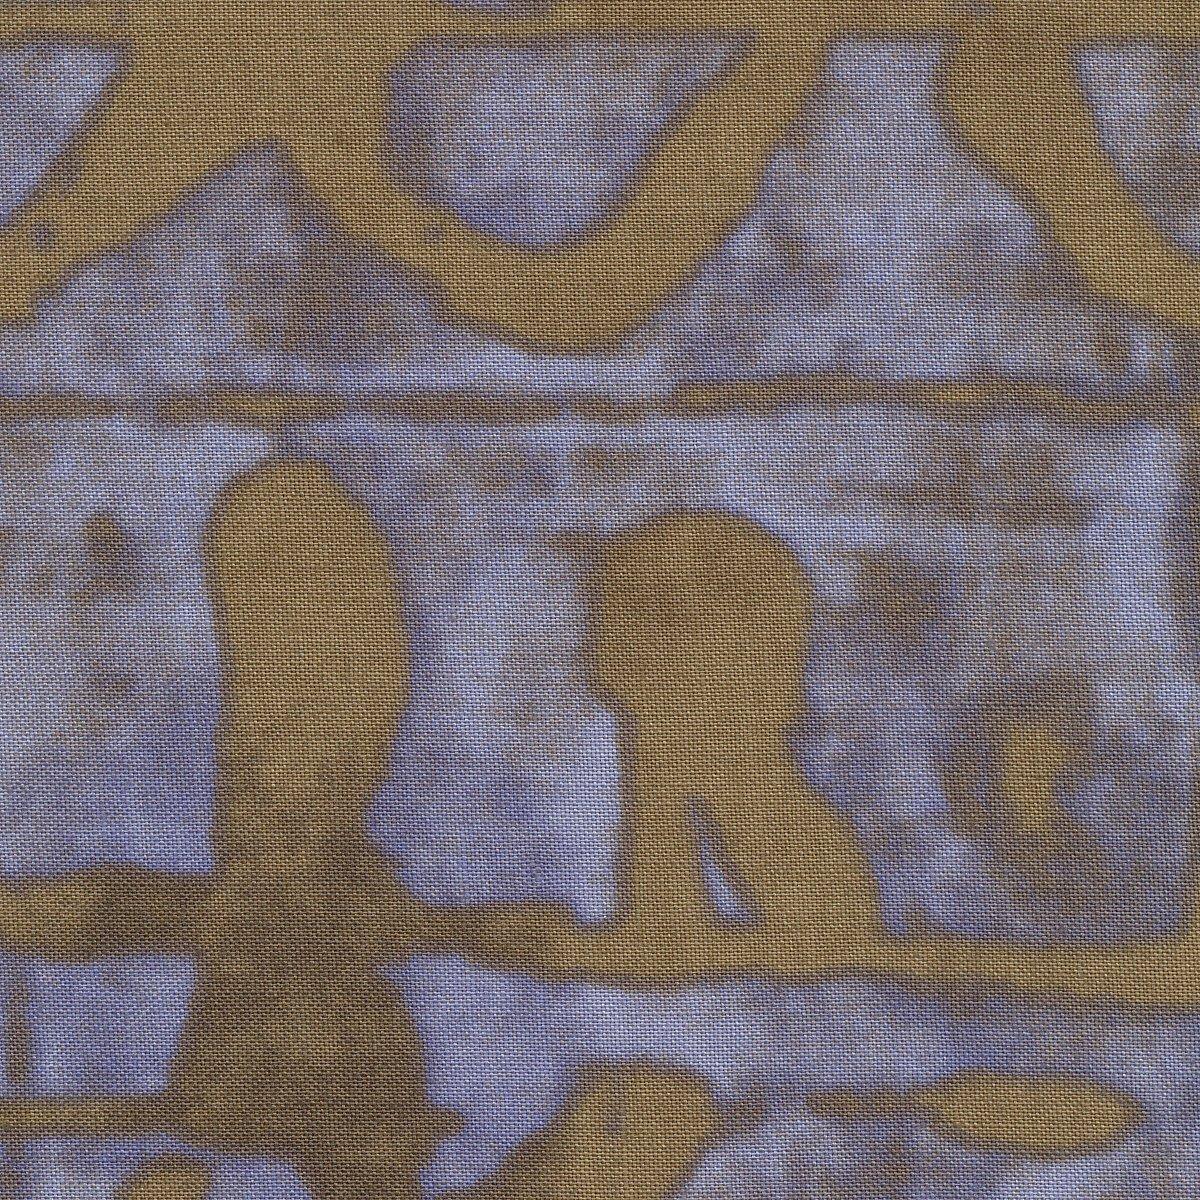 Alphabet - 41792-11